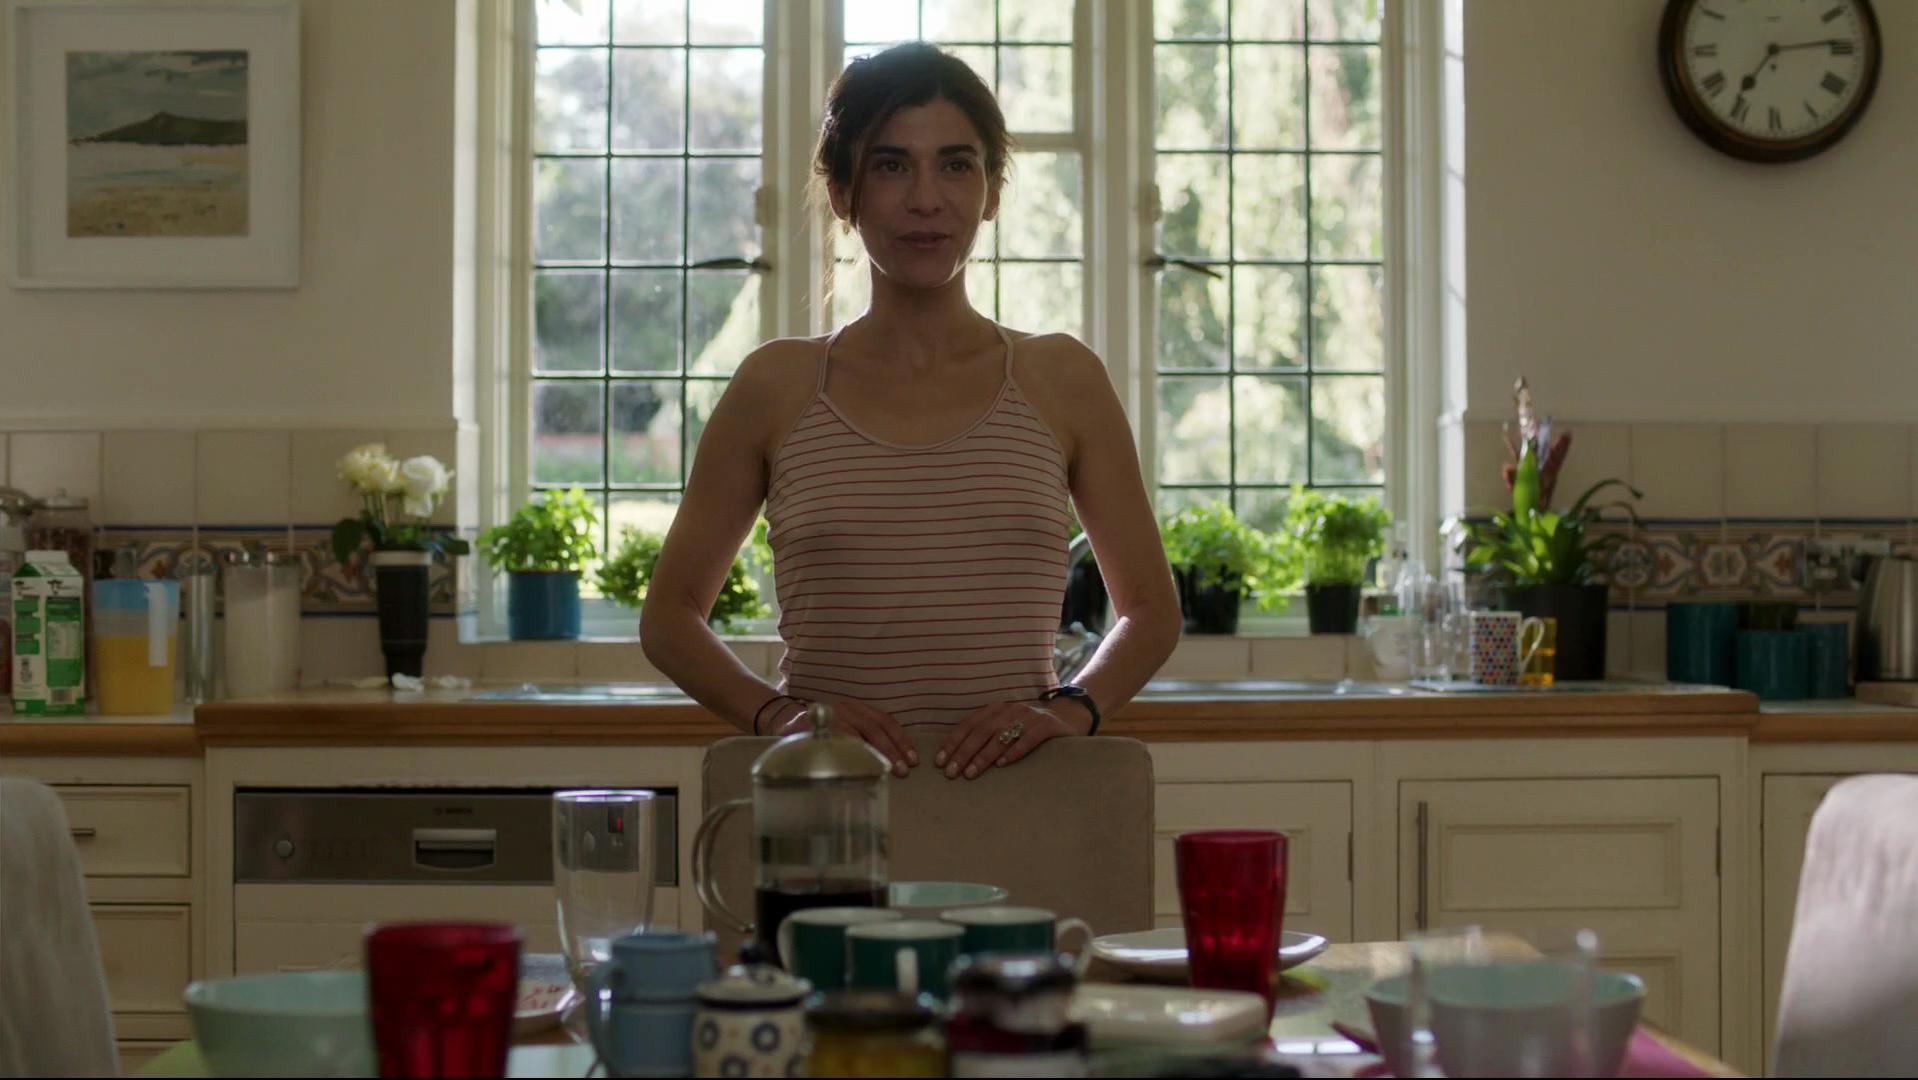 Lubna Azabal nude - The Honourable Woman s01e07 (2014)